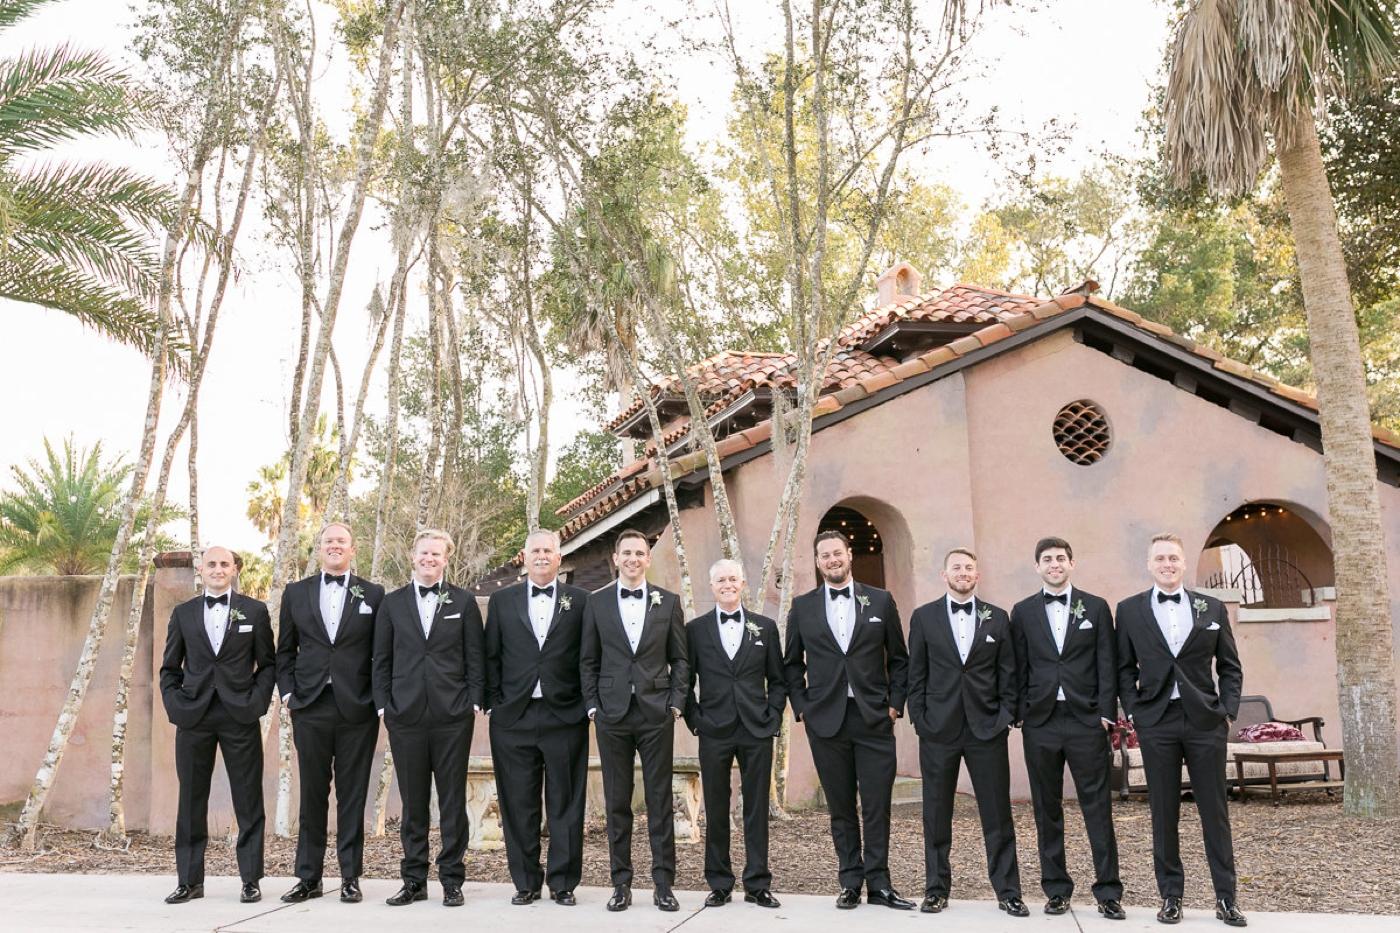 orlando groomsmen attire